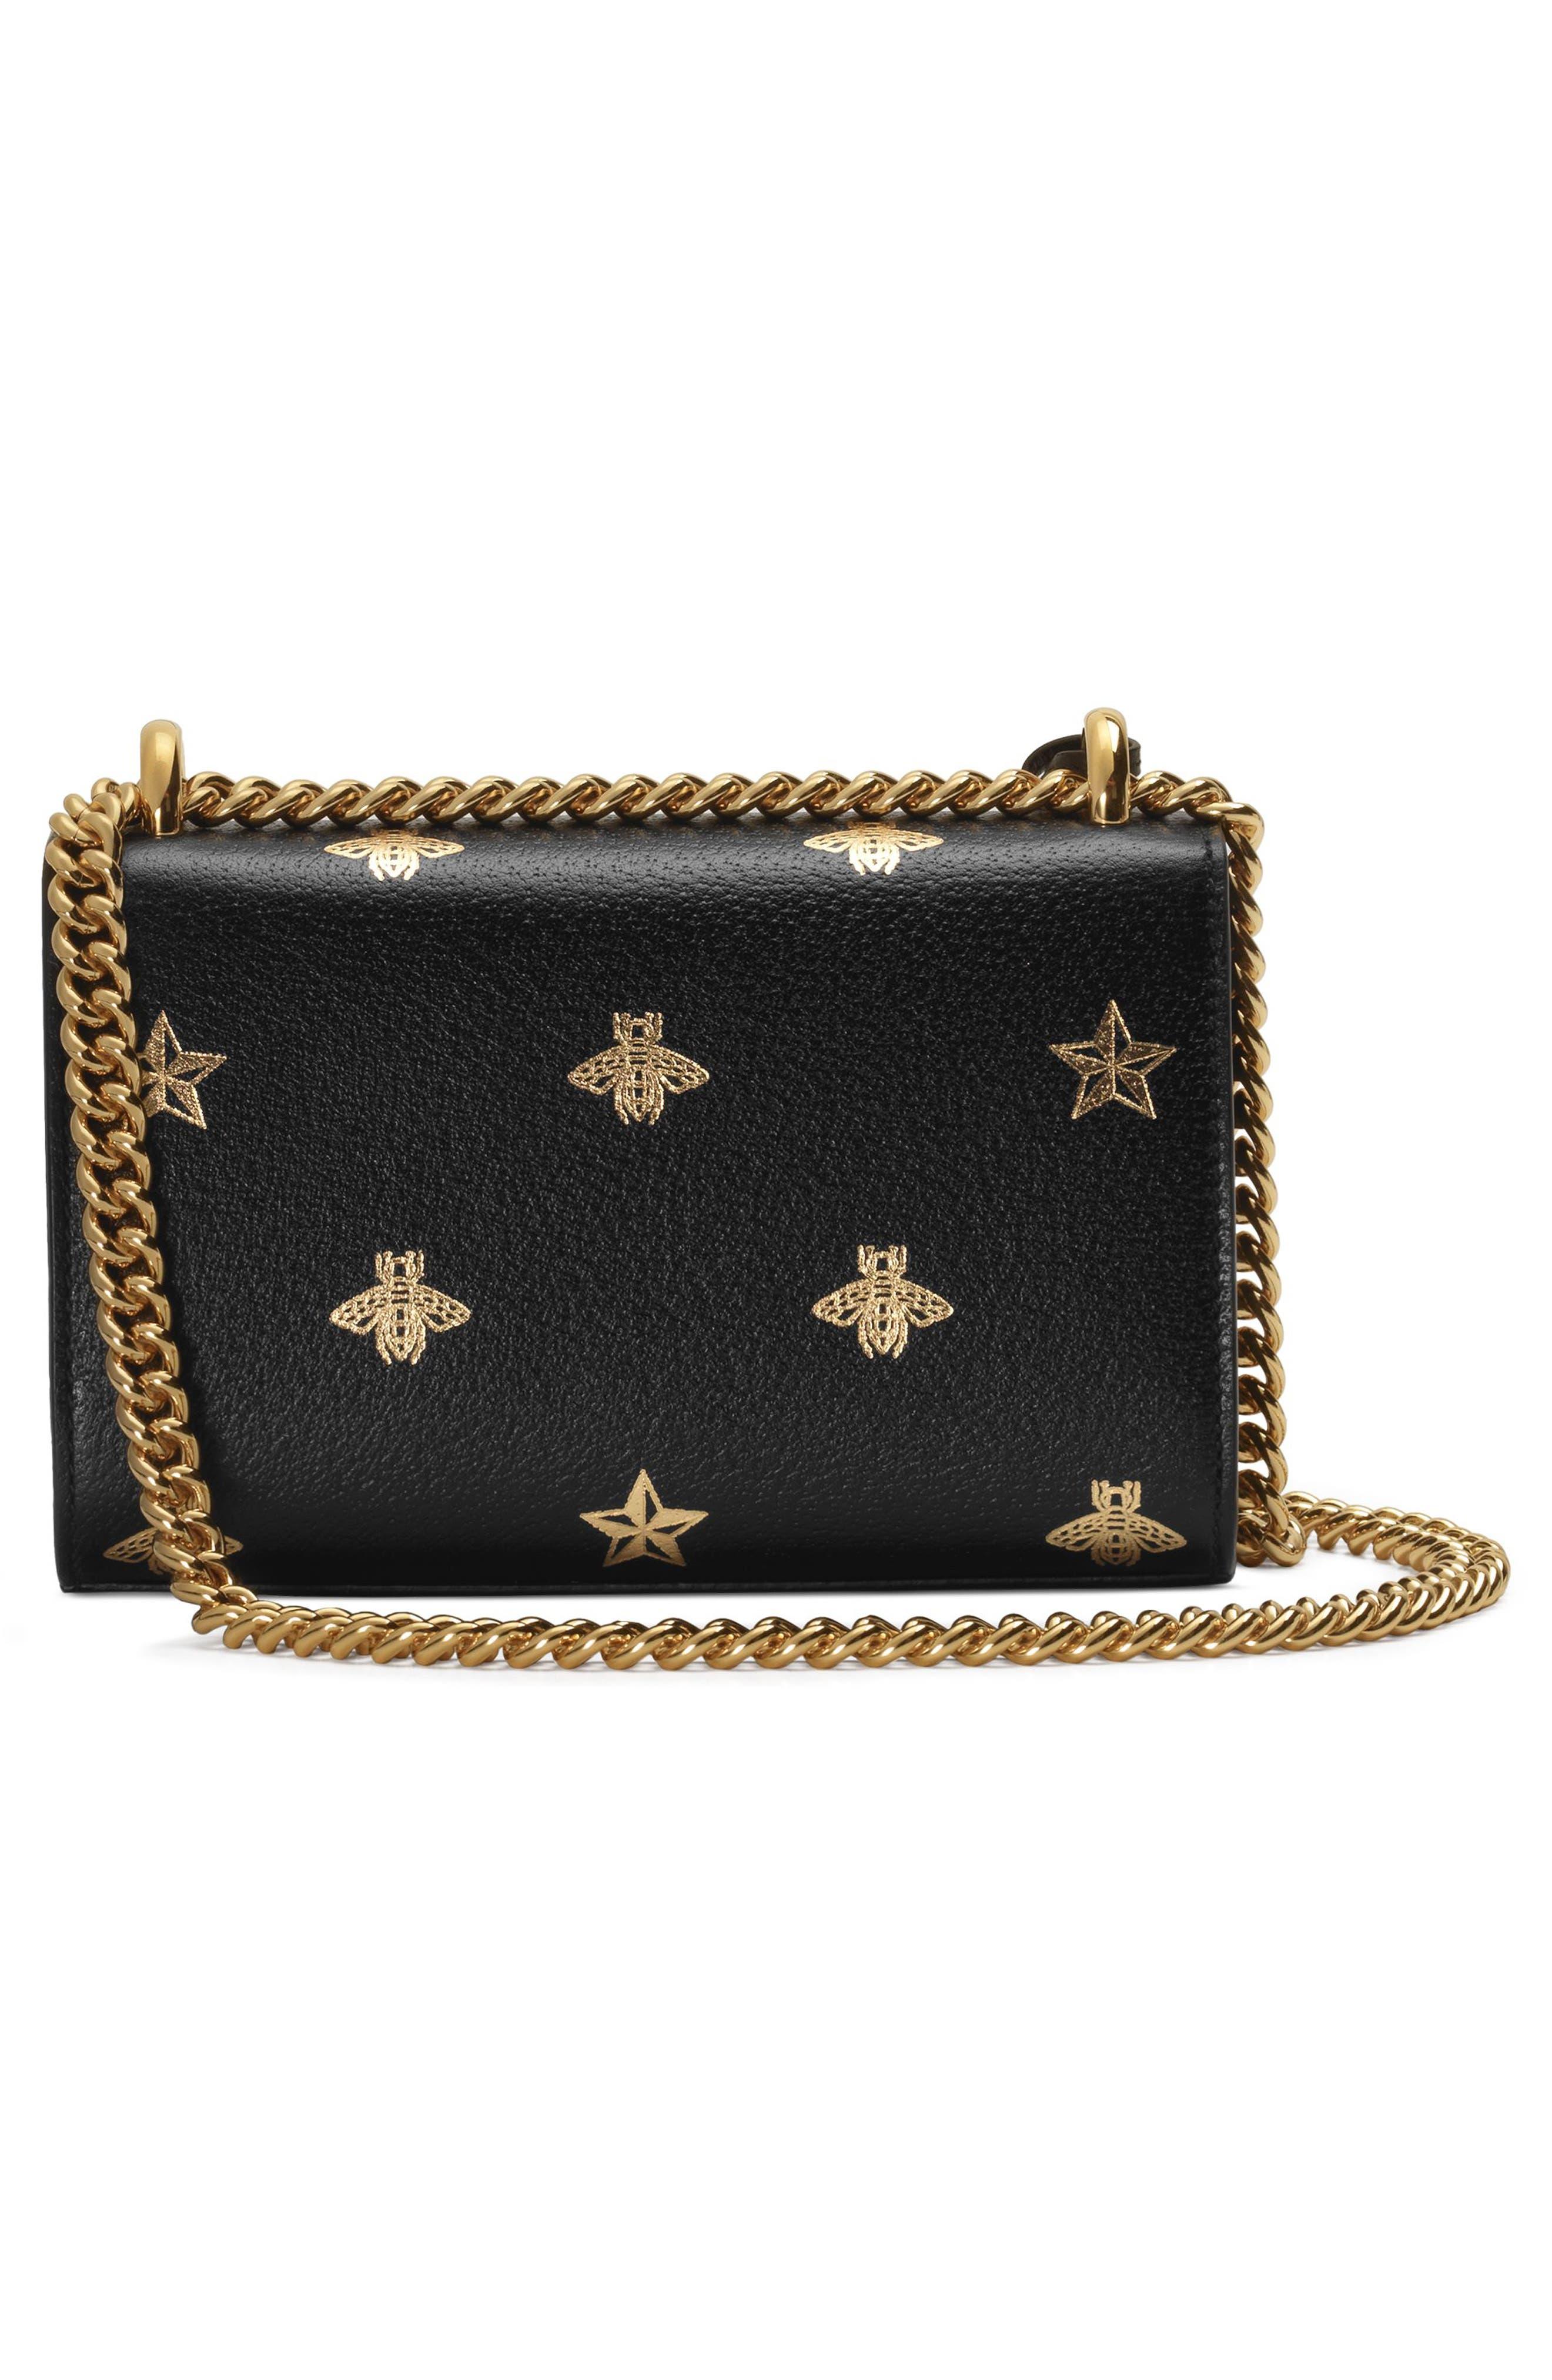 GUCCI, Mini Padlock Leather Shoulder Bag, Alternate thumbnail 2, color, NERO/ ORO